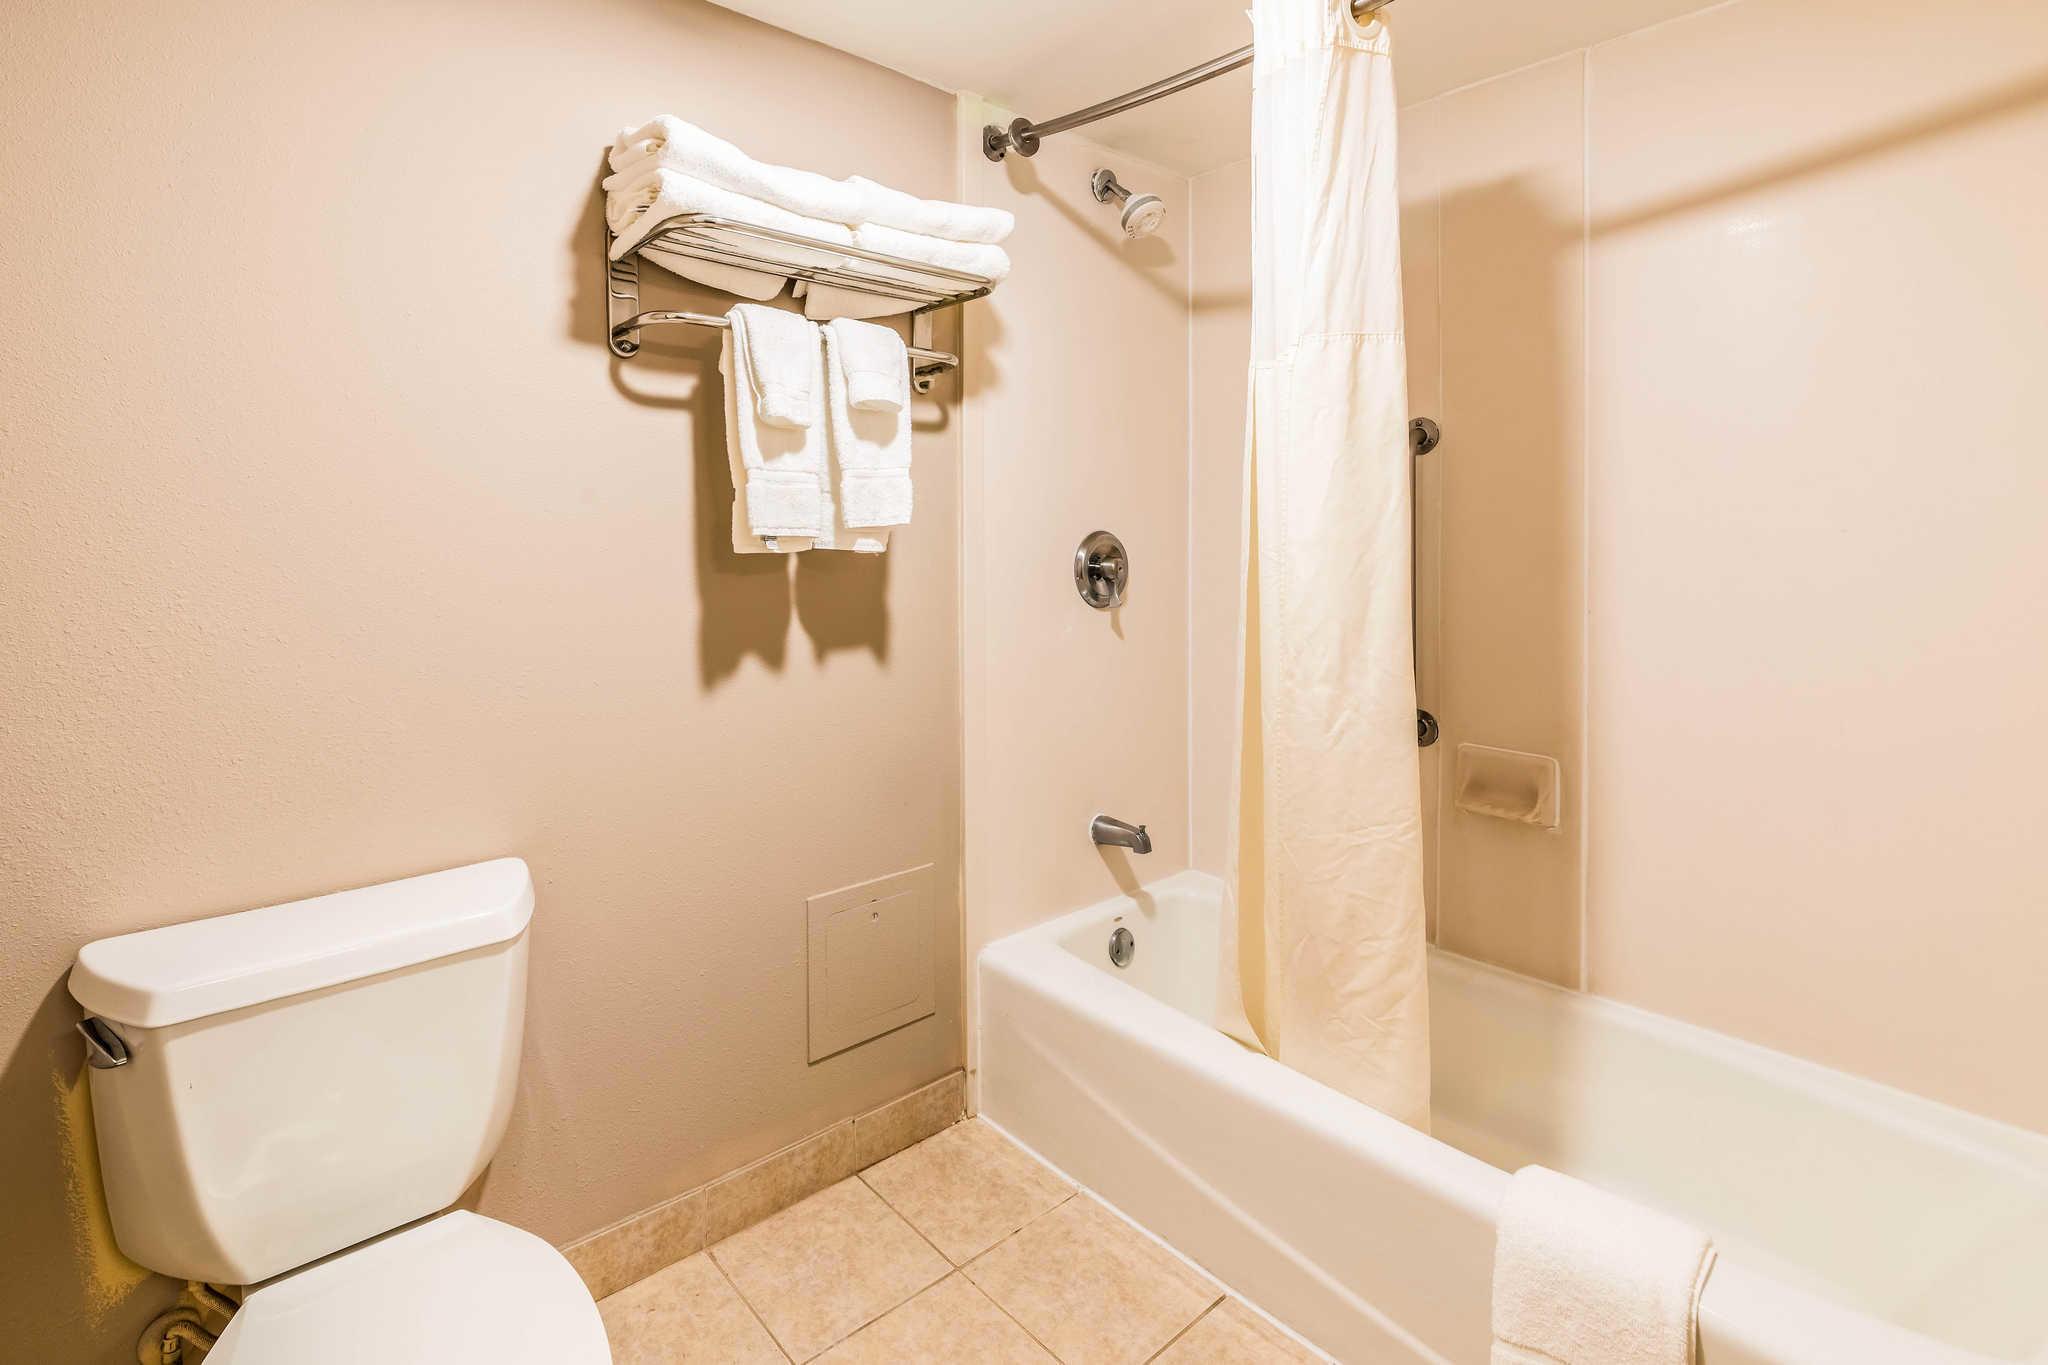 Clarion Inn & Suites image 16